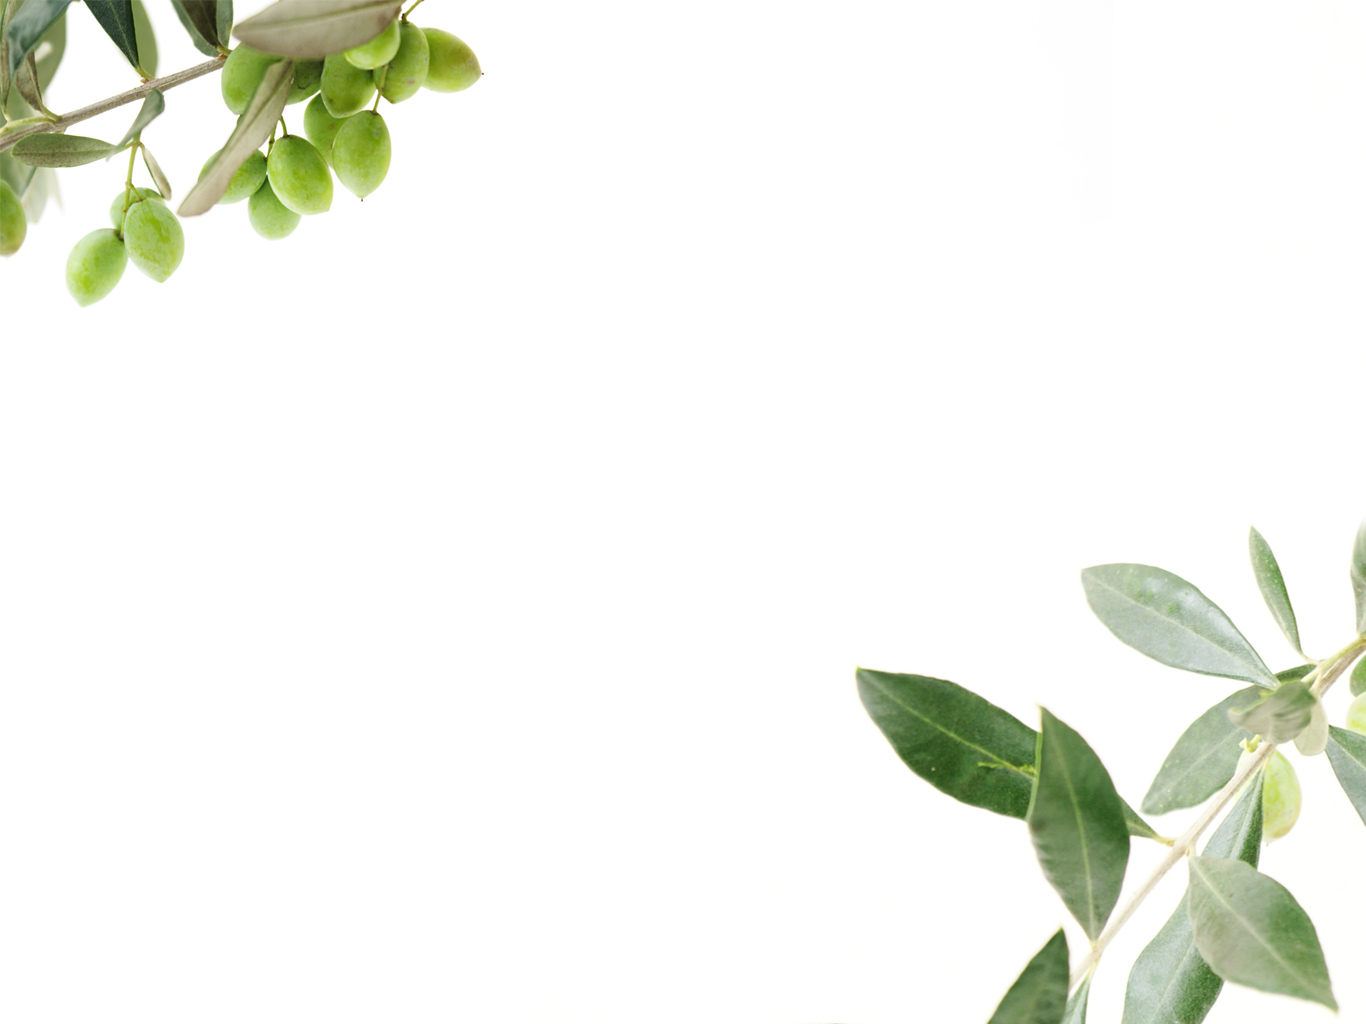 Olive Oil Wallpaper 1366x1024